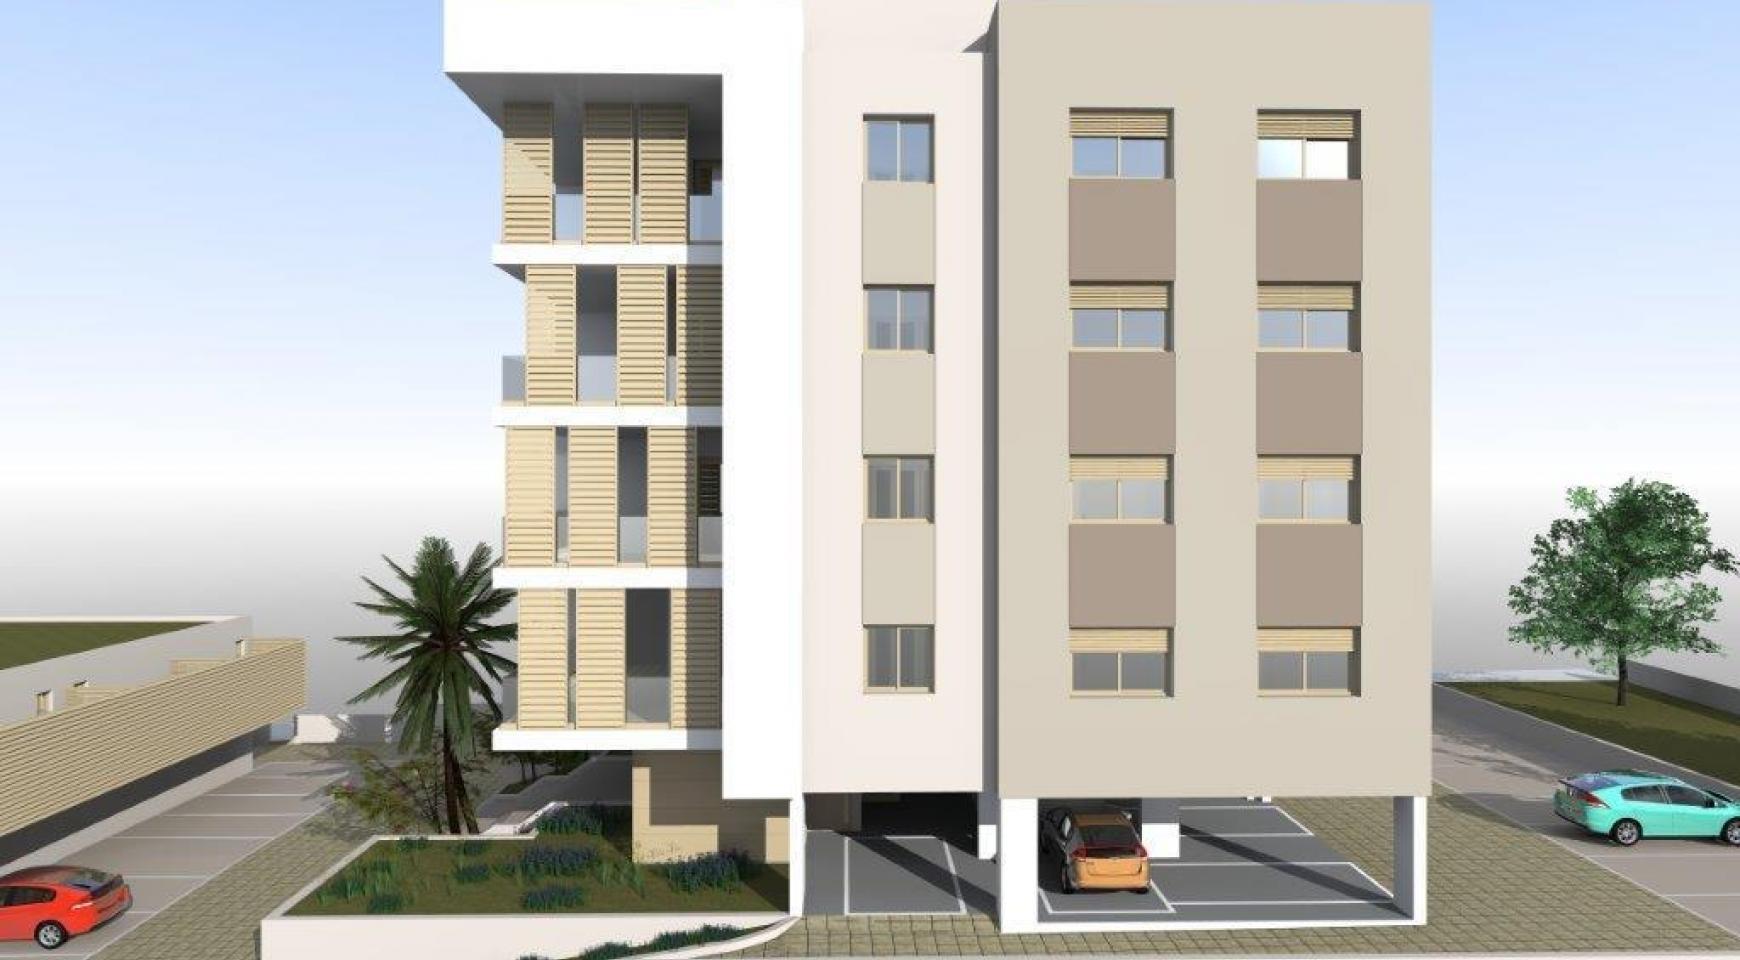 New Spacious 3 Bedroom Apartment  near the Sea - 5